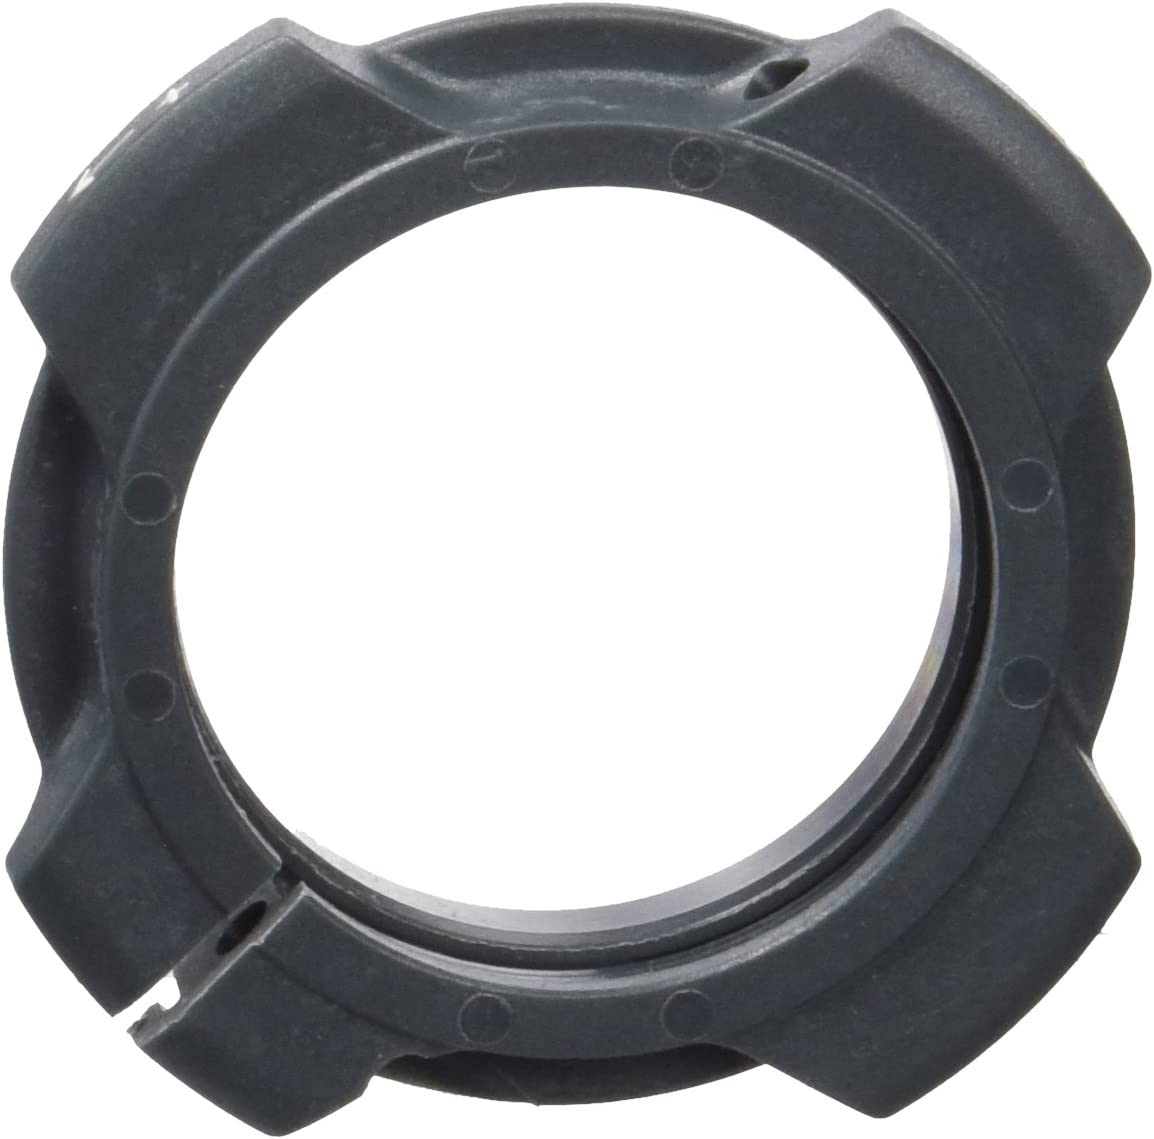 One Size SRAM Crank Bearing Preload Adjuster for BB30//PF30 Black